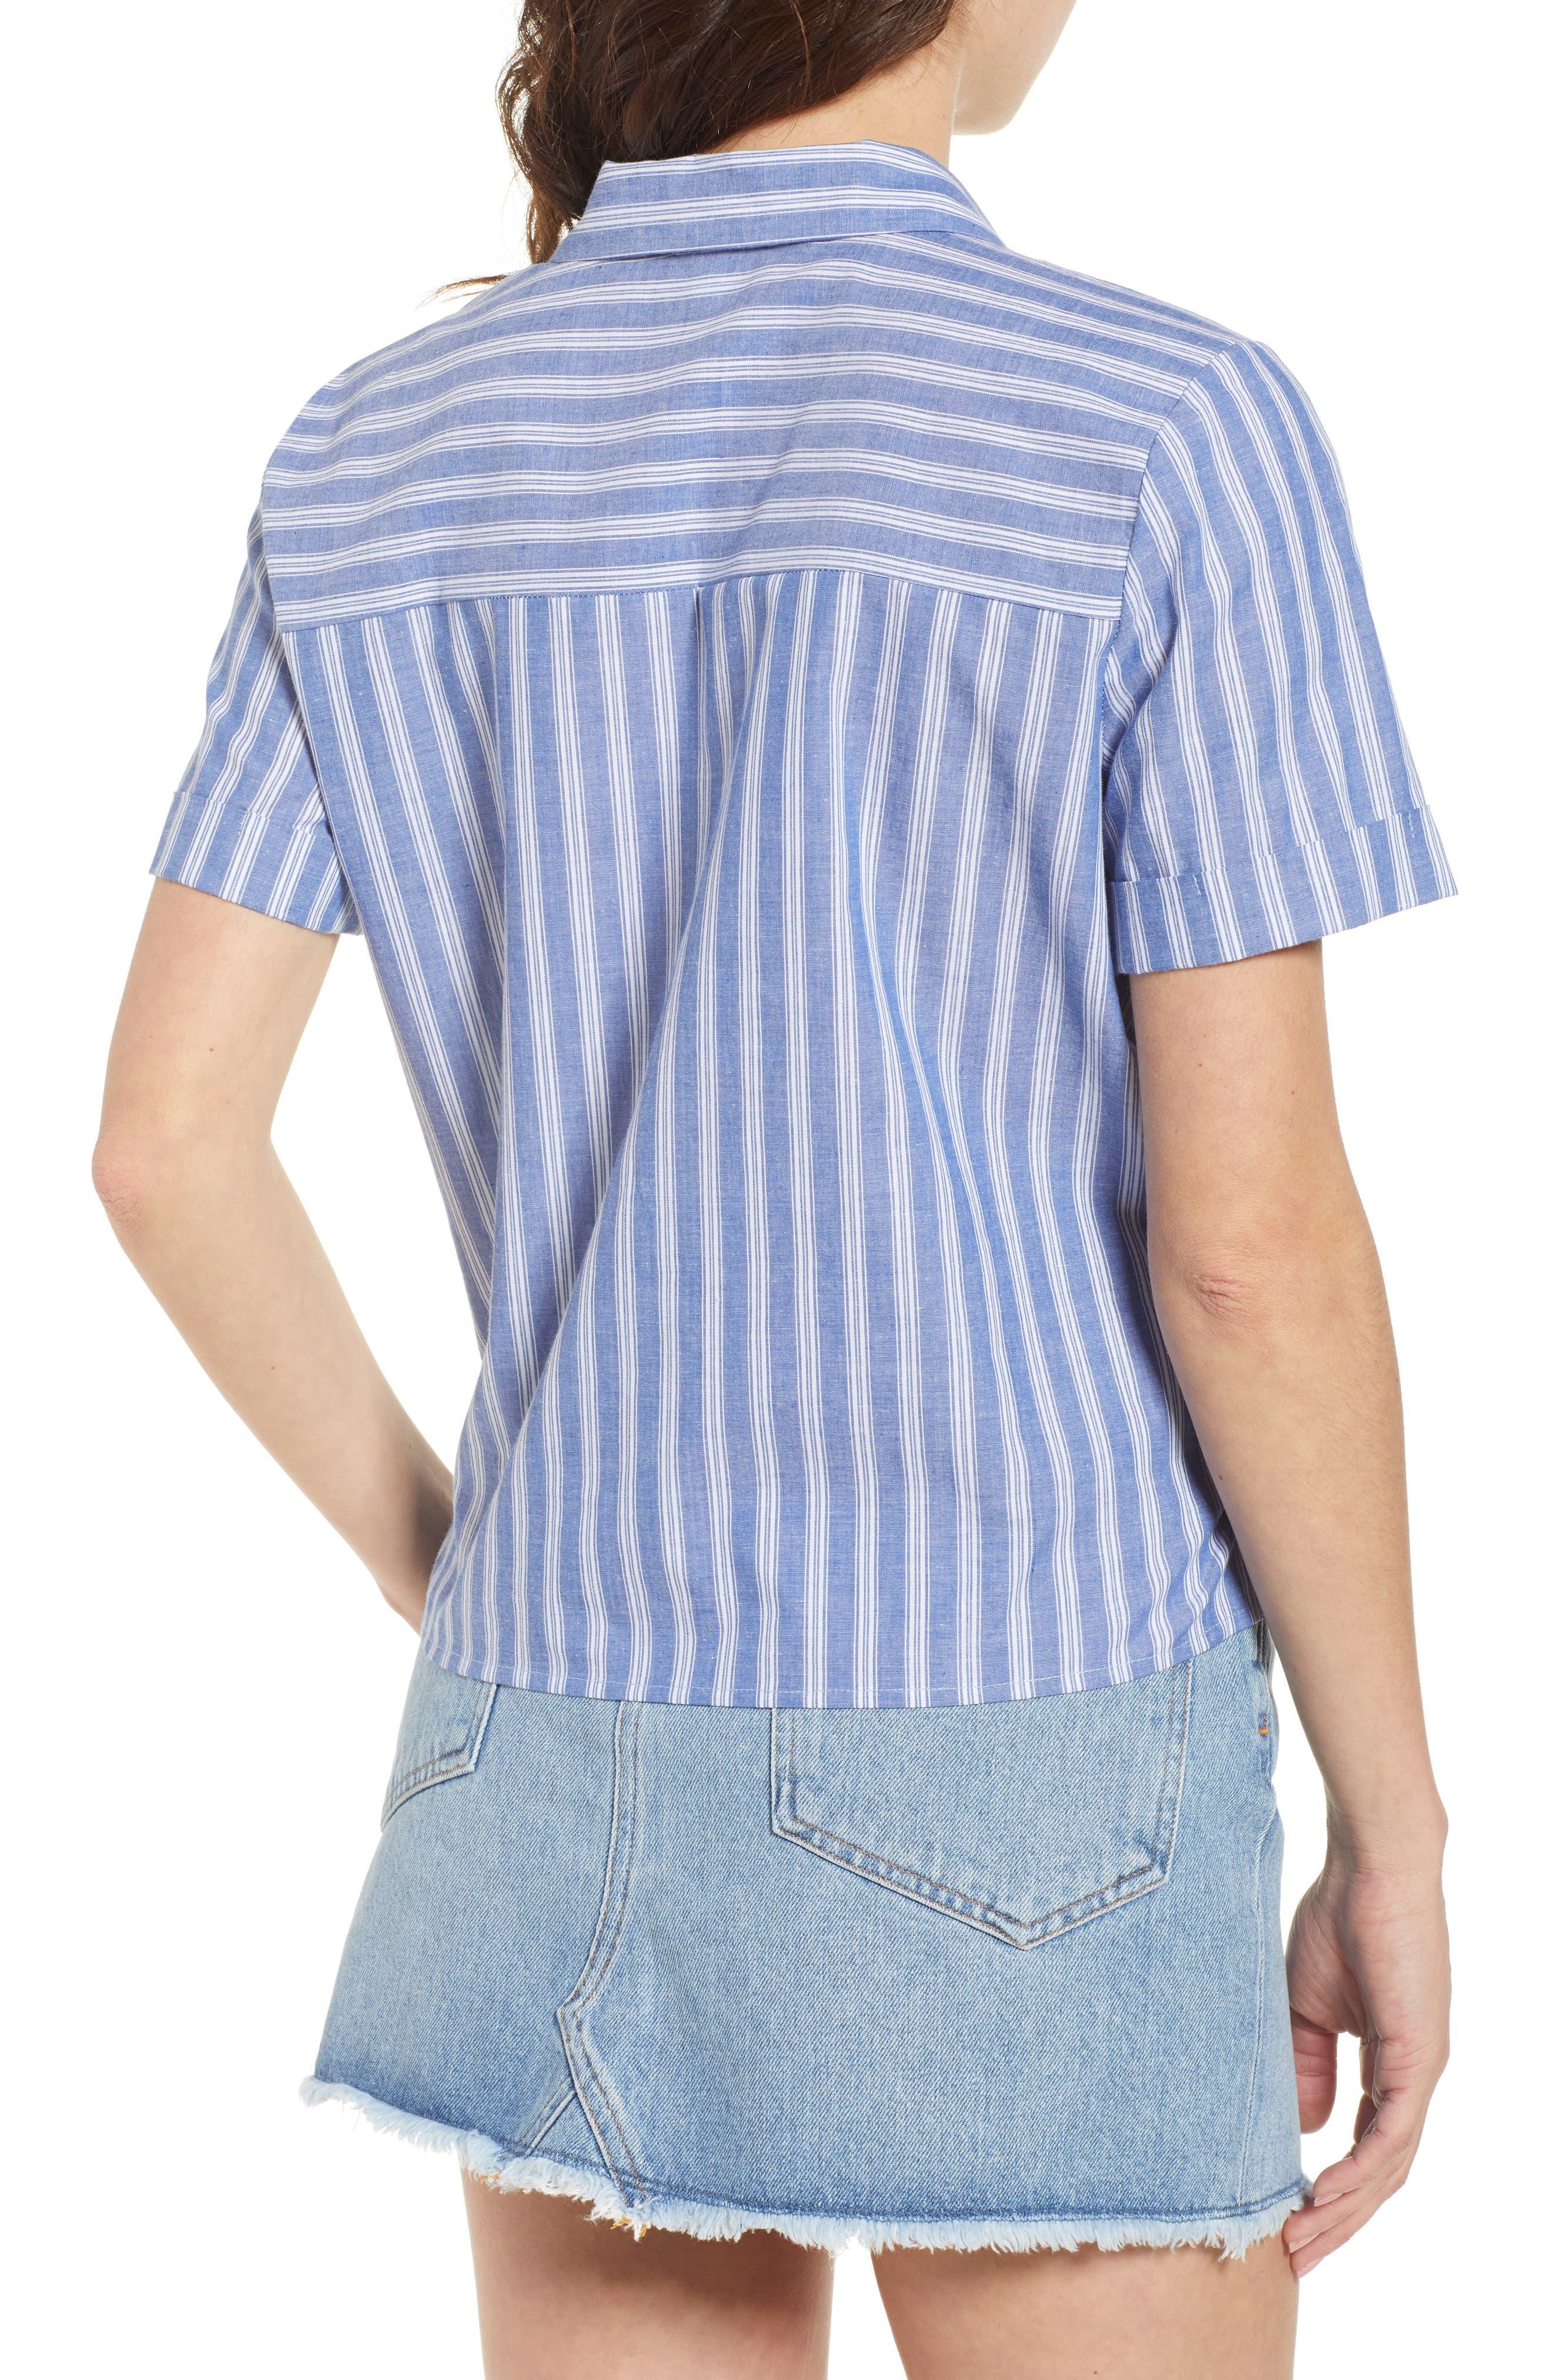 Stripe Tie Hem Top,                             Alternate thumbnail 2, color,                             Blue Celestial Stripe